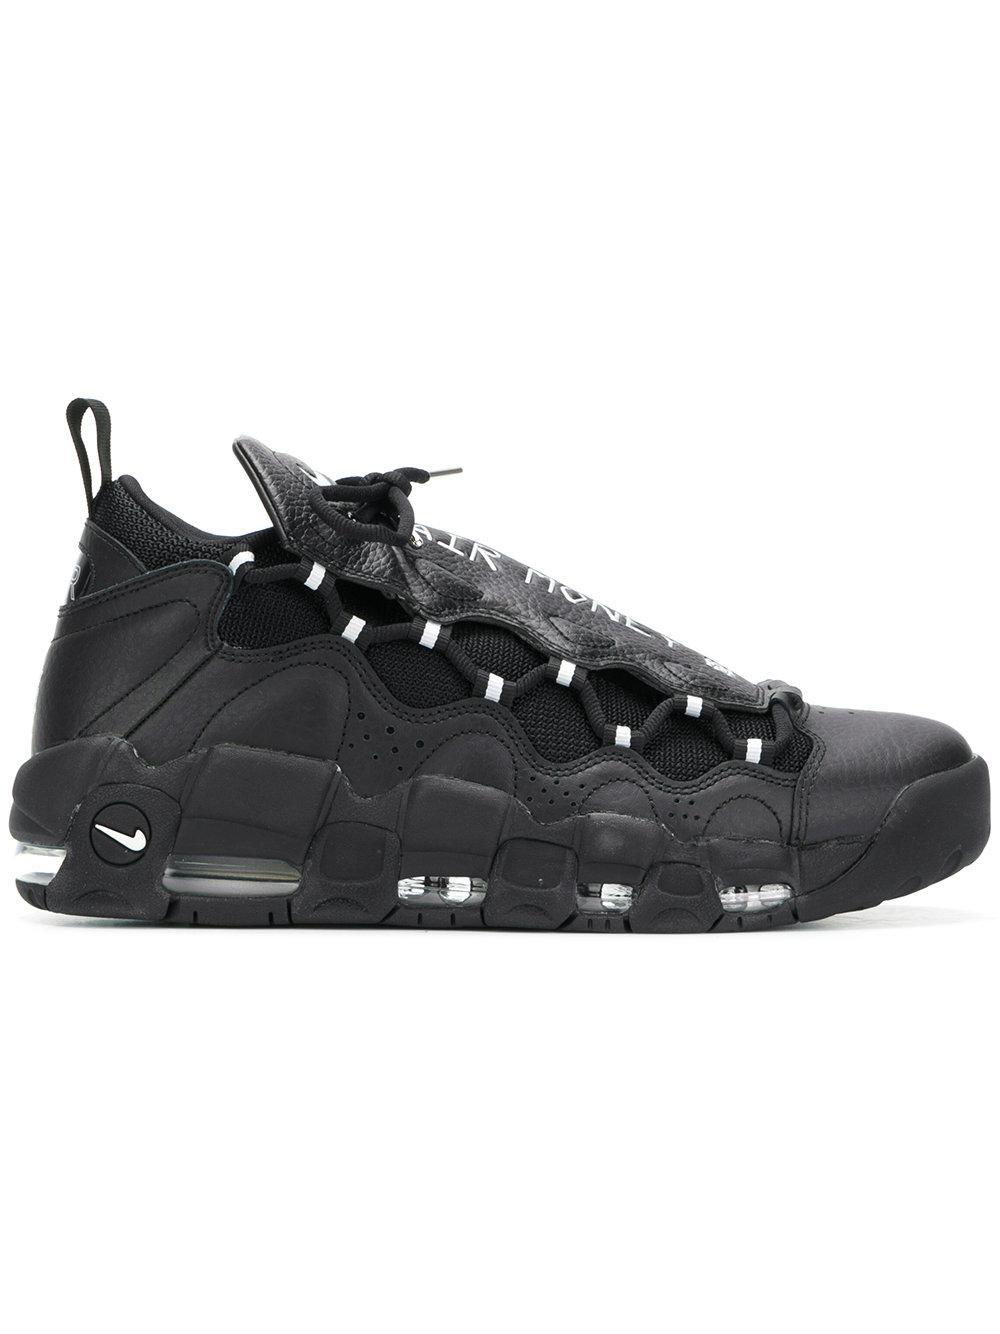 eef3df5bf Nike Men's Air More Money Basketball Shoes, Black | ModeSens